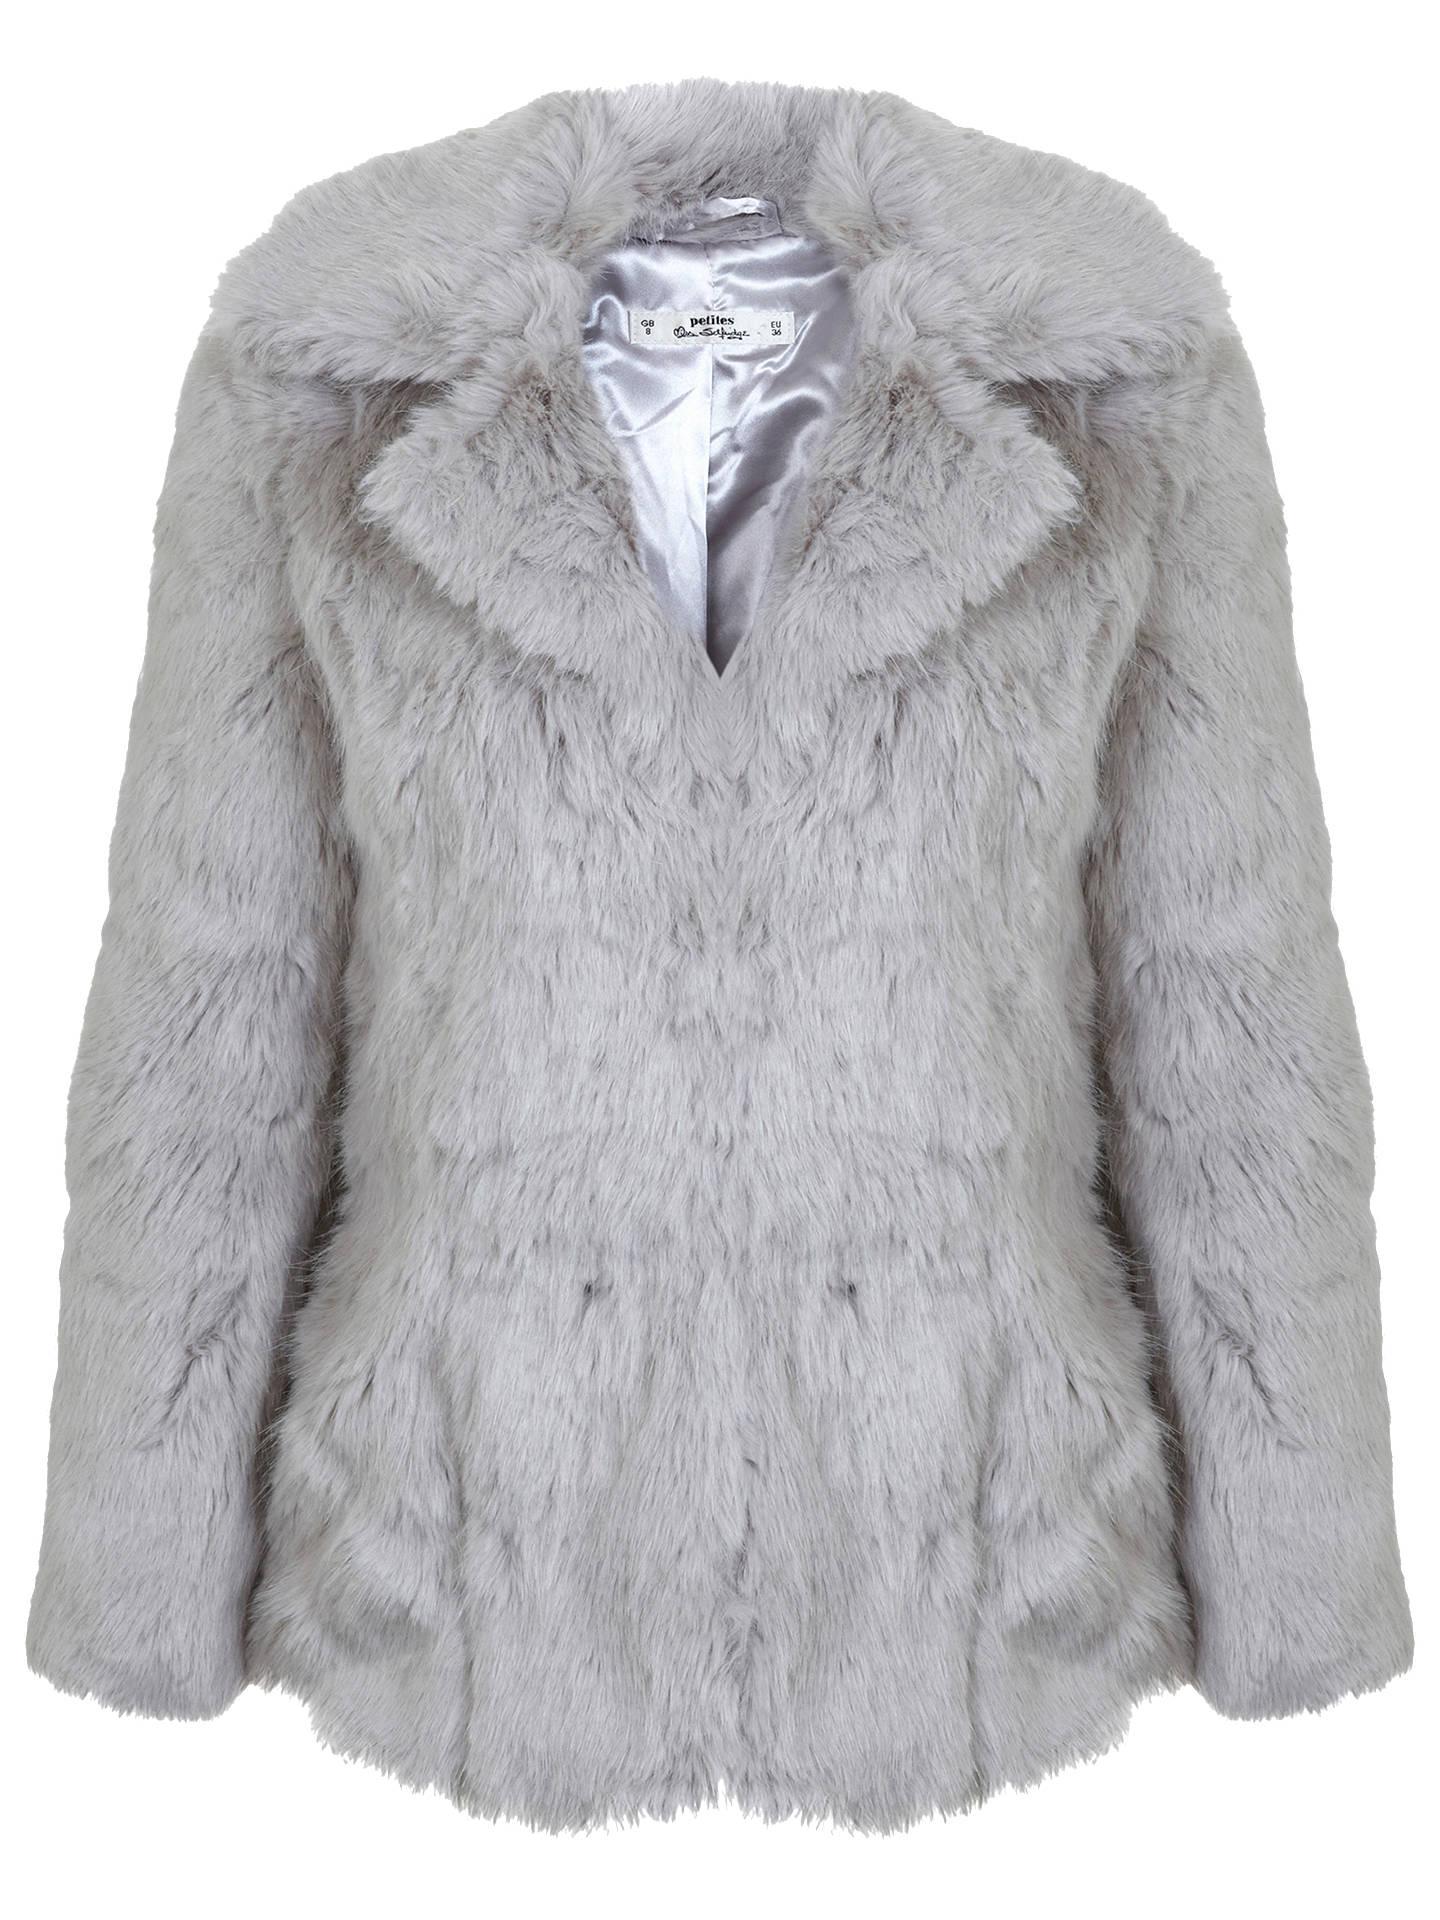 1dba3be192068 Buy Miss Selfridge Petite Faux Fur Coat